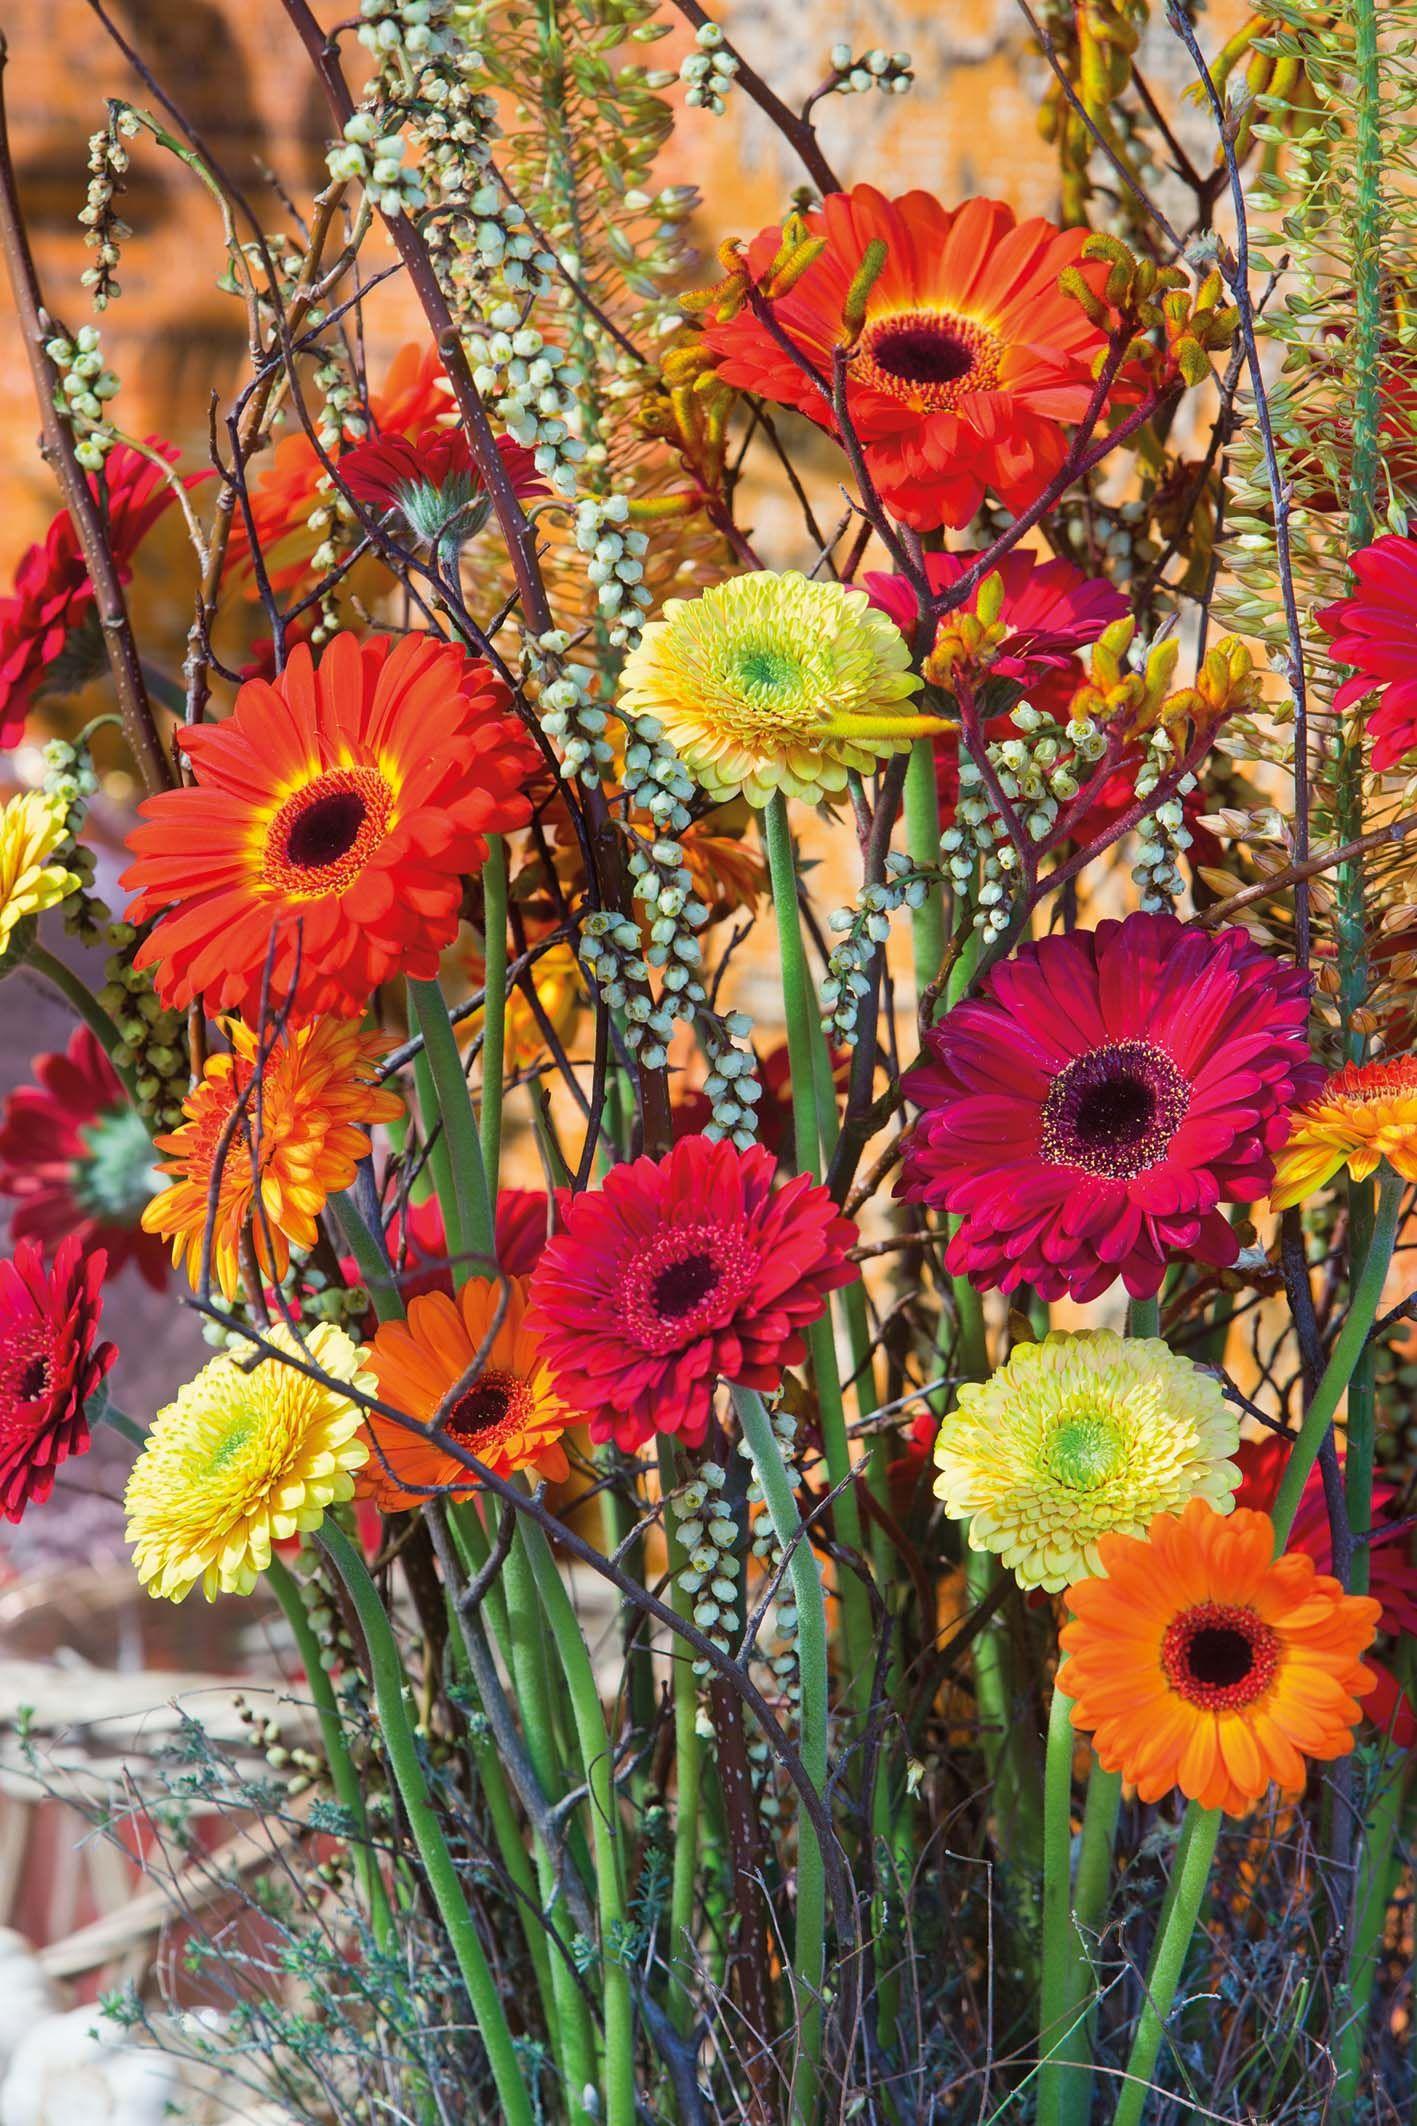 Close-up of a wonderful gerbera bouquet #orangegerberas #redgerberas #inspiration #colouredbygerbera #dutchgerbera